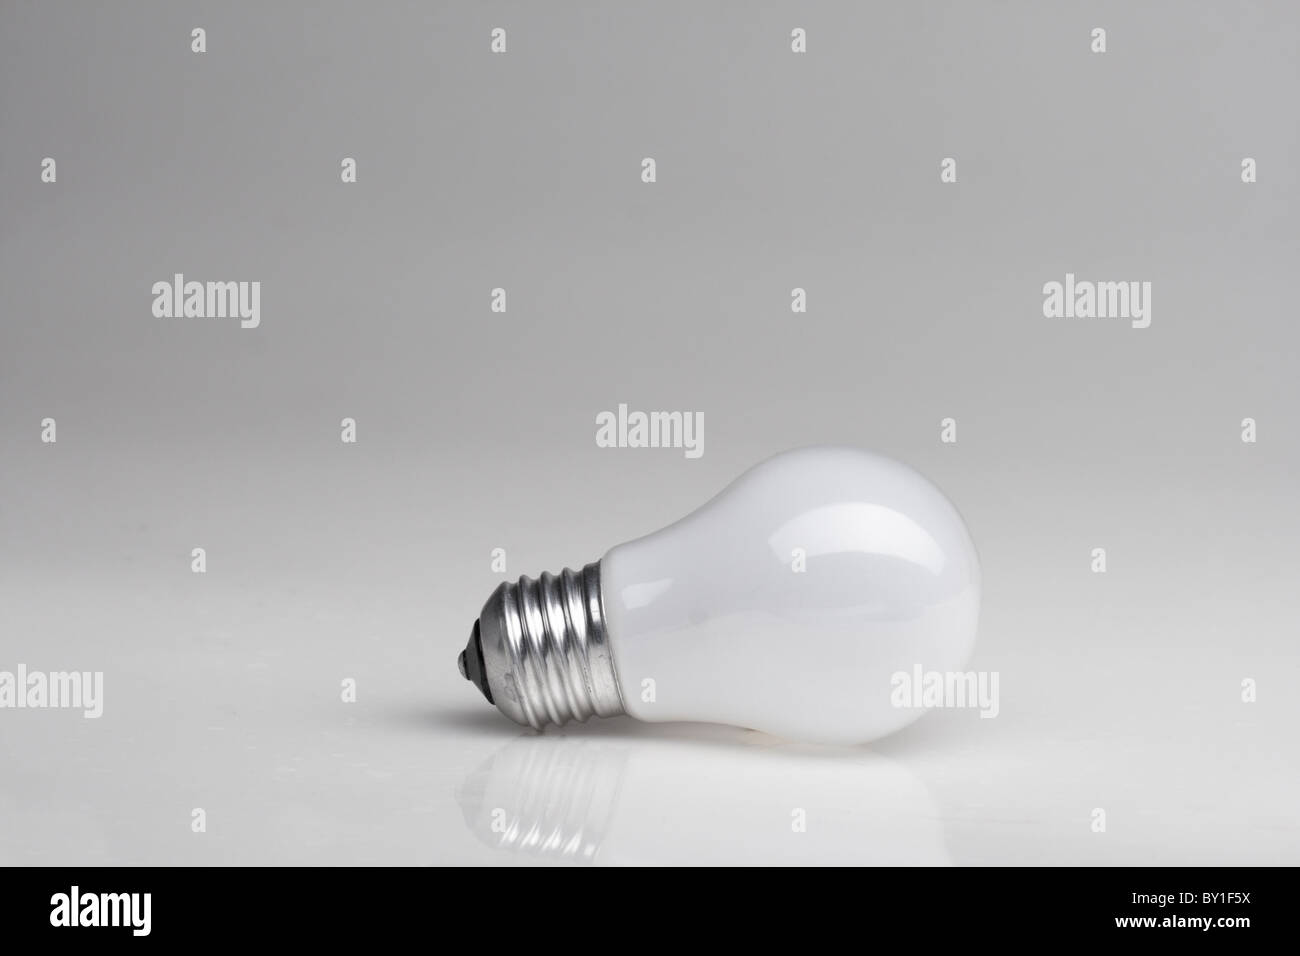 Background with lightbulb - Stock Image